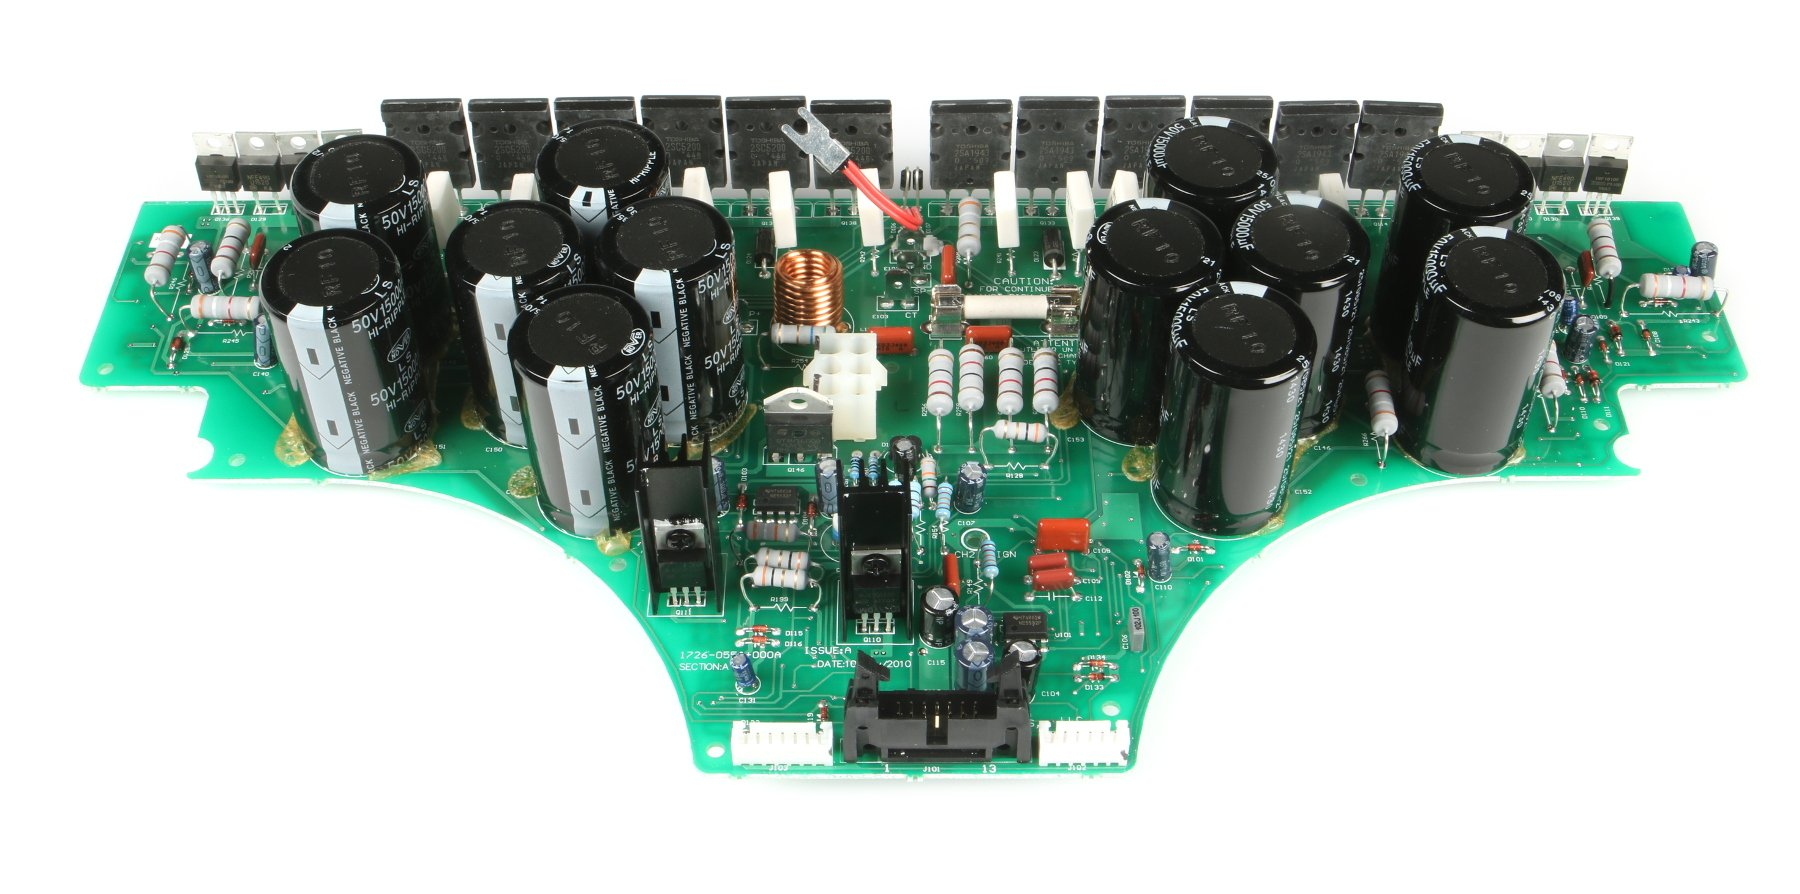 Amp Module PCB for RMX 4050HD